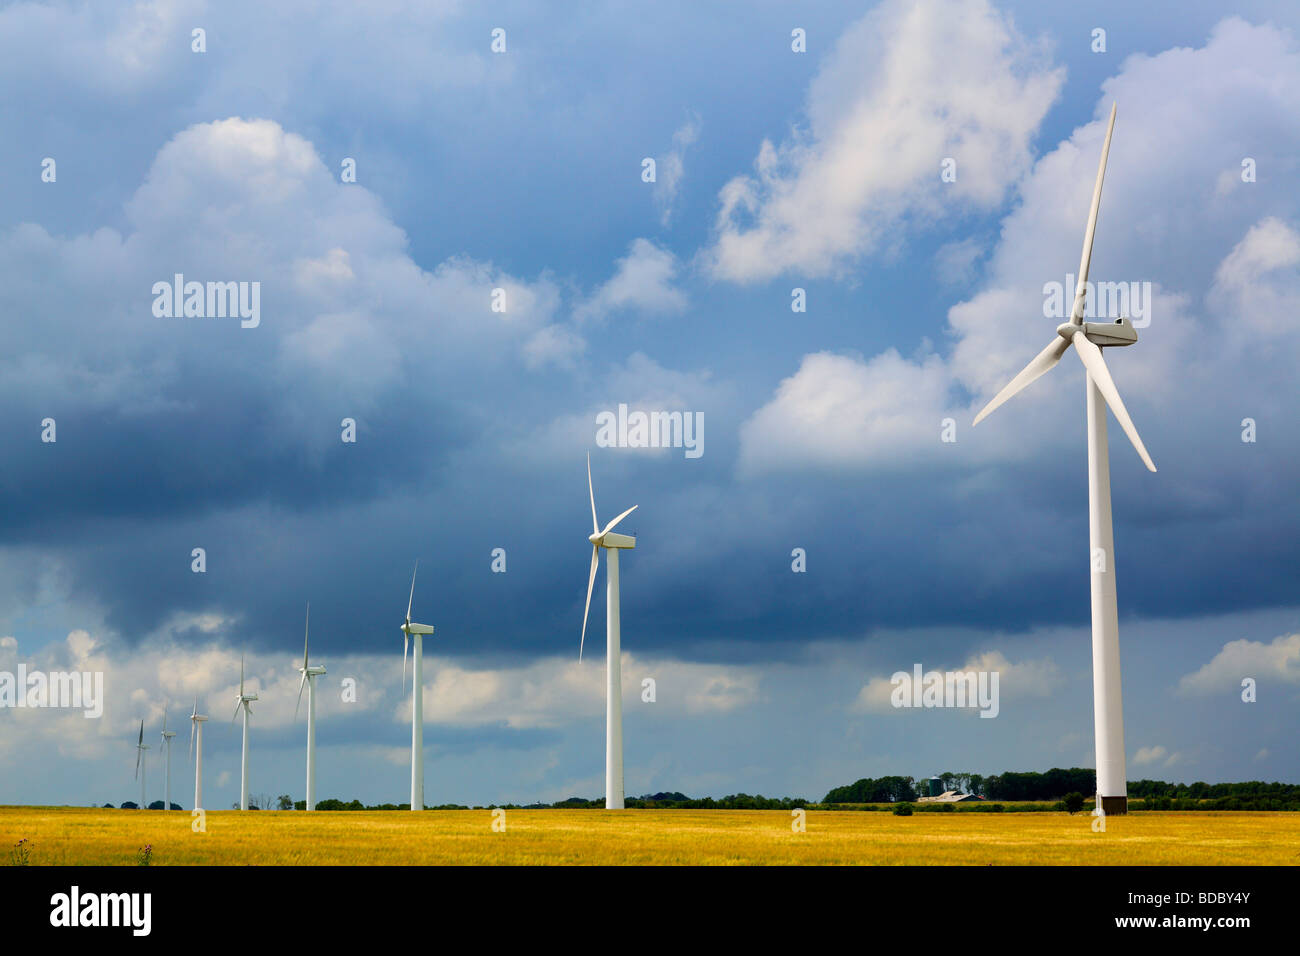 Row of wind turbines in Denmark - Stock Image